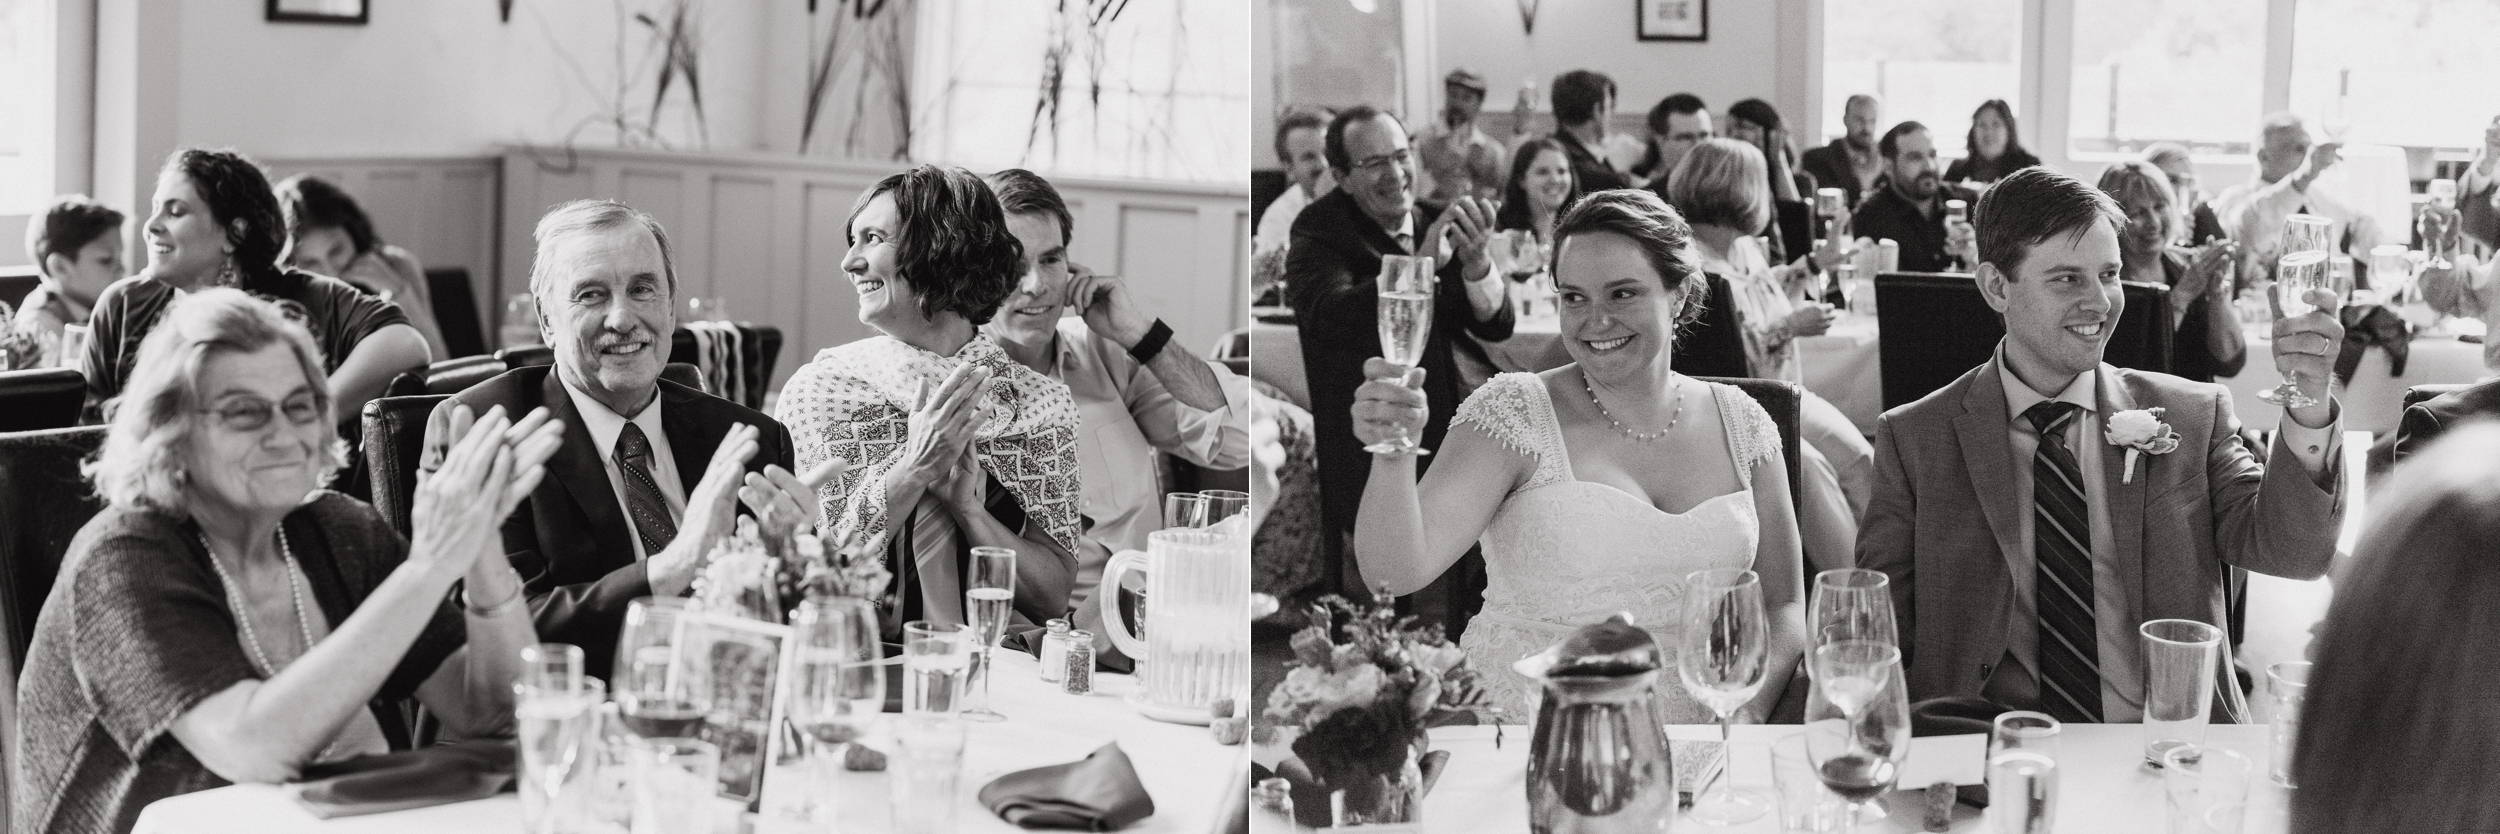 092-highland-dell-lodge-russian-river-wedding-vivianchen-561_WEB.jpg